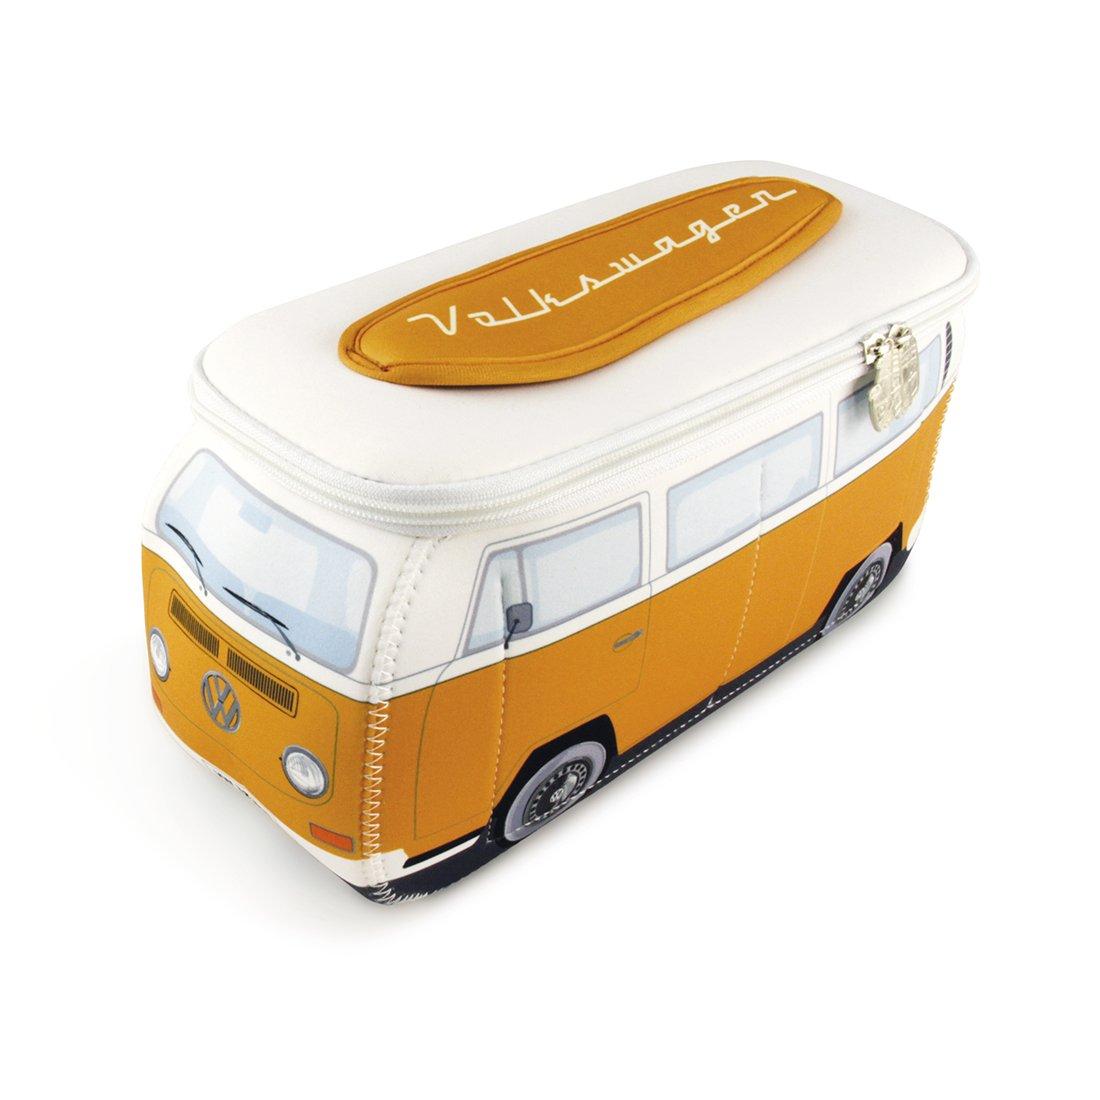 BRISA VW Collection - Volkswagen Samba Bus T2 Camper Van 3D Neoprene Universal Bag - Makeup, Travel, Cosmetic Bag (Neoprene/Orange)